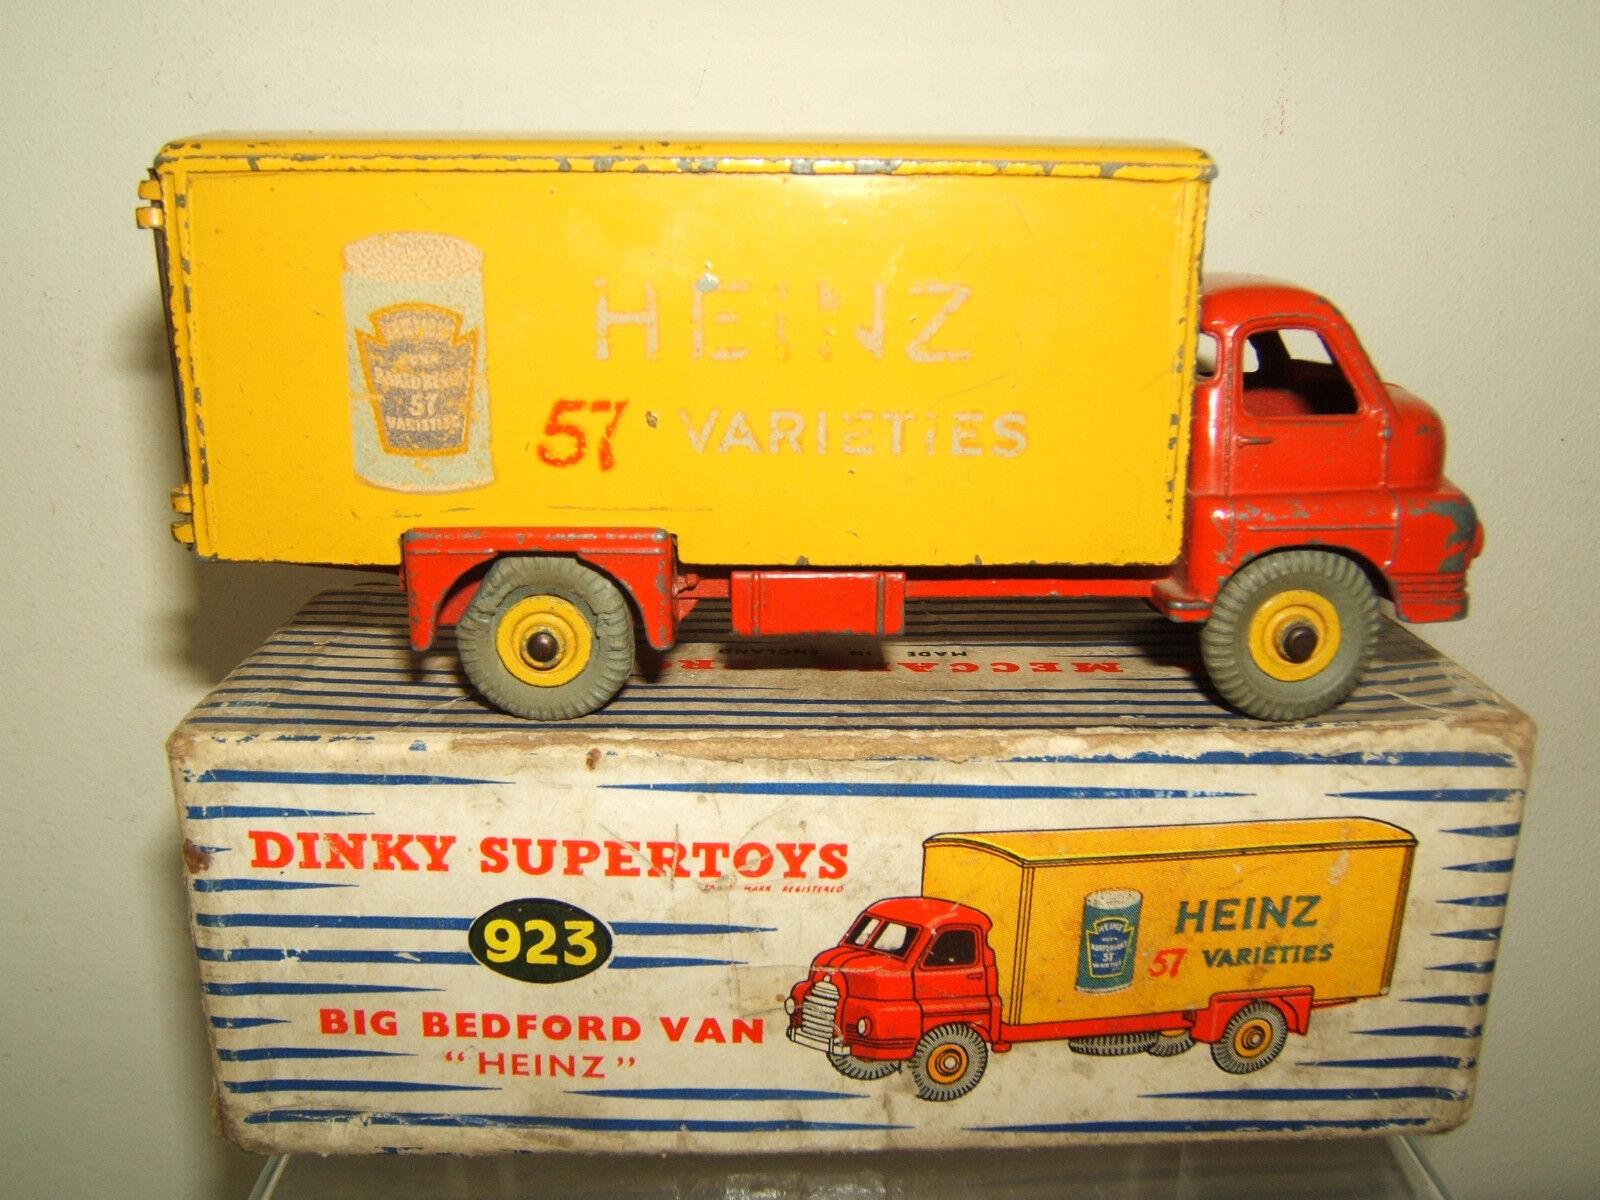 Dinky Toys Modelo No.923 'Heinz' gran Bedford Van VN MIB